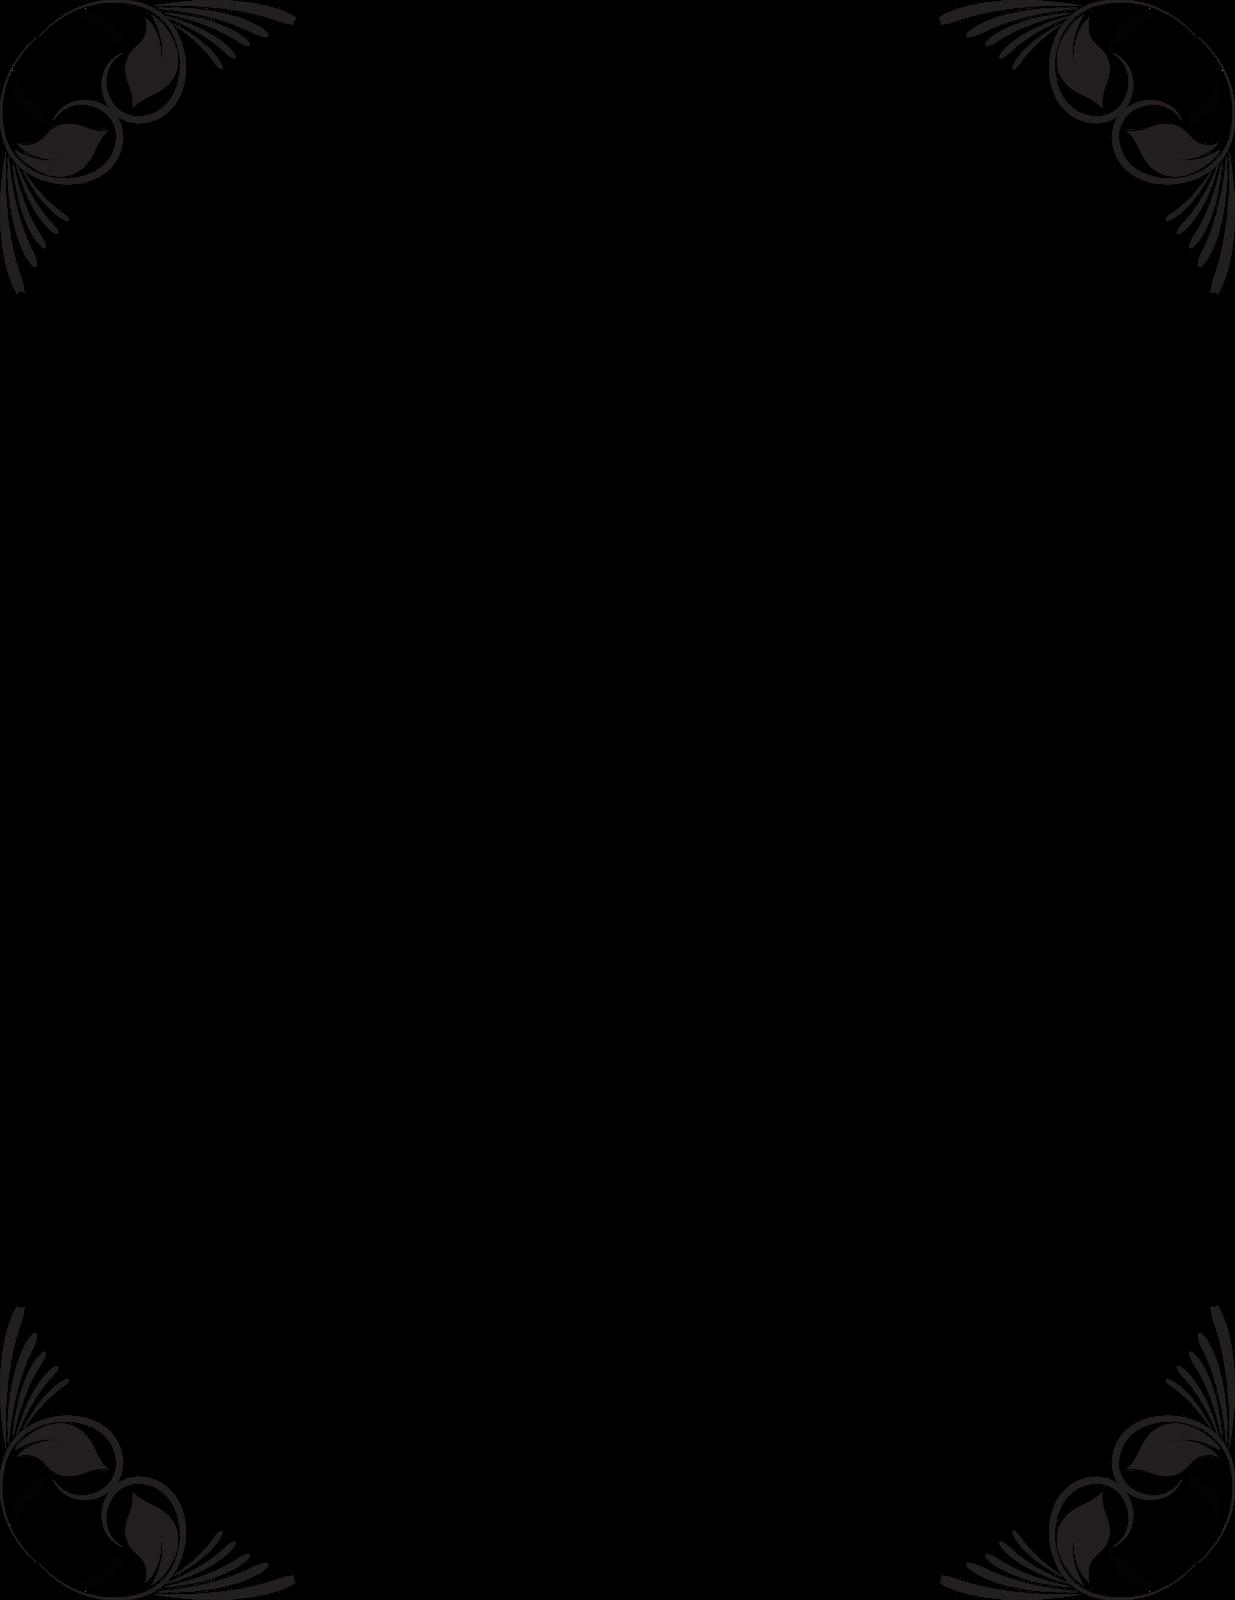 vector transparent Coreldraw border . Free borders clipart